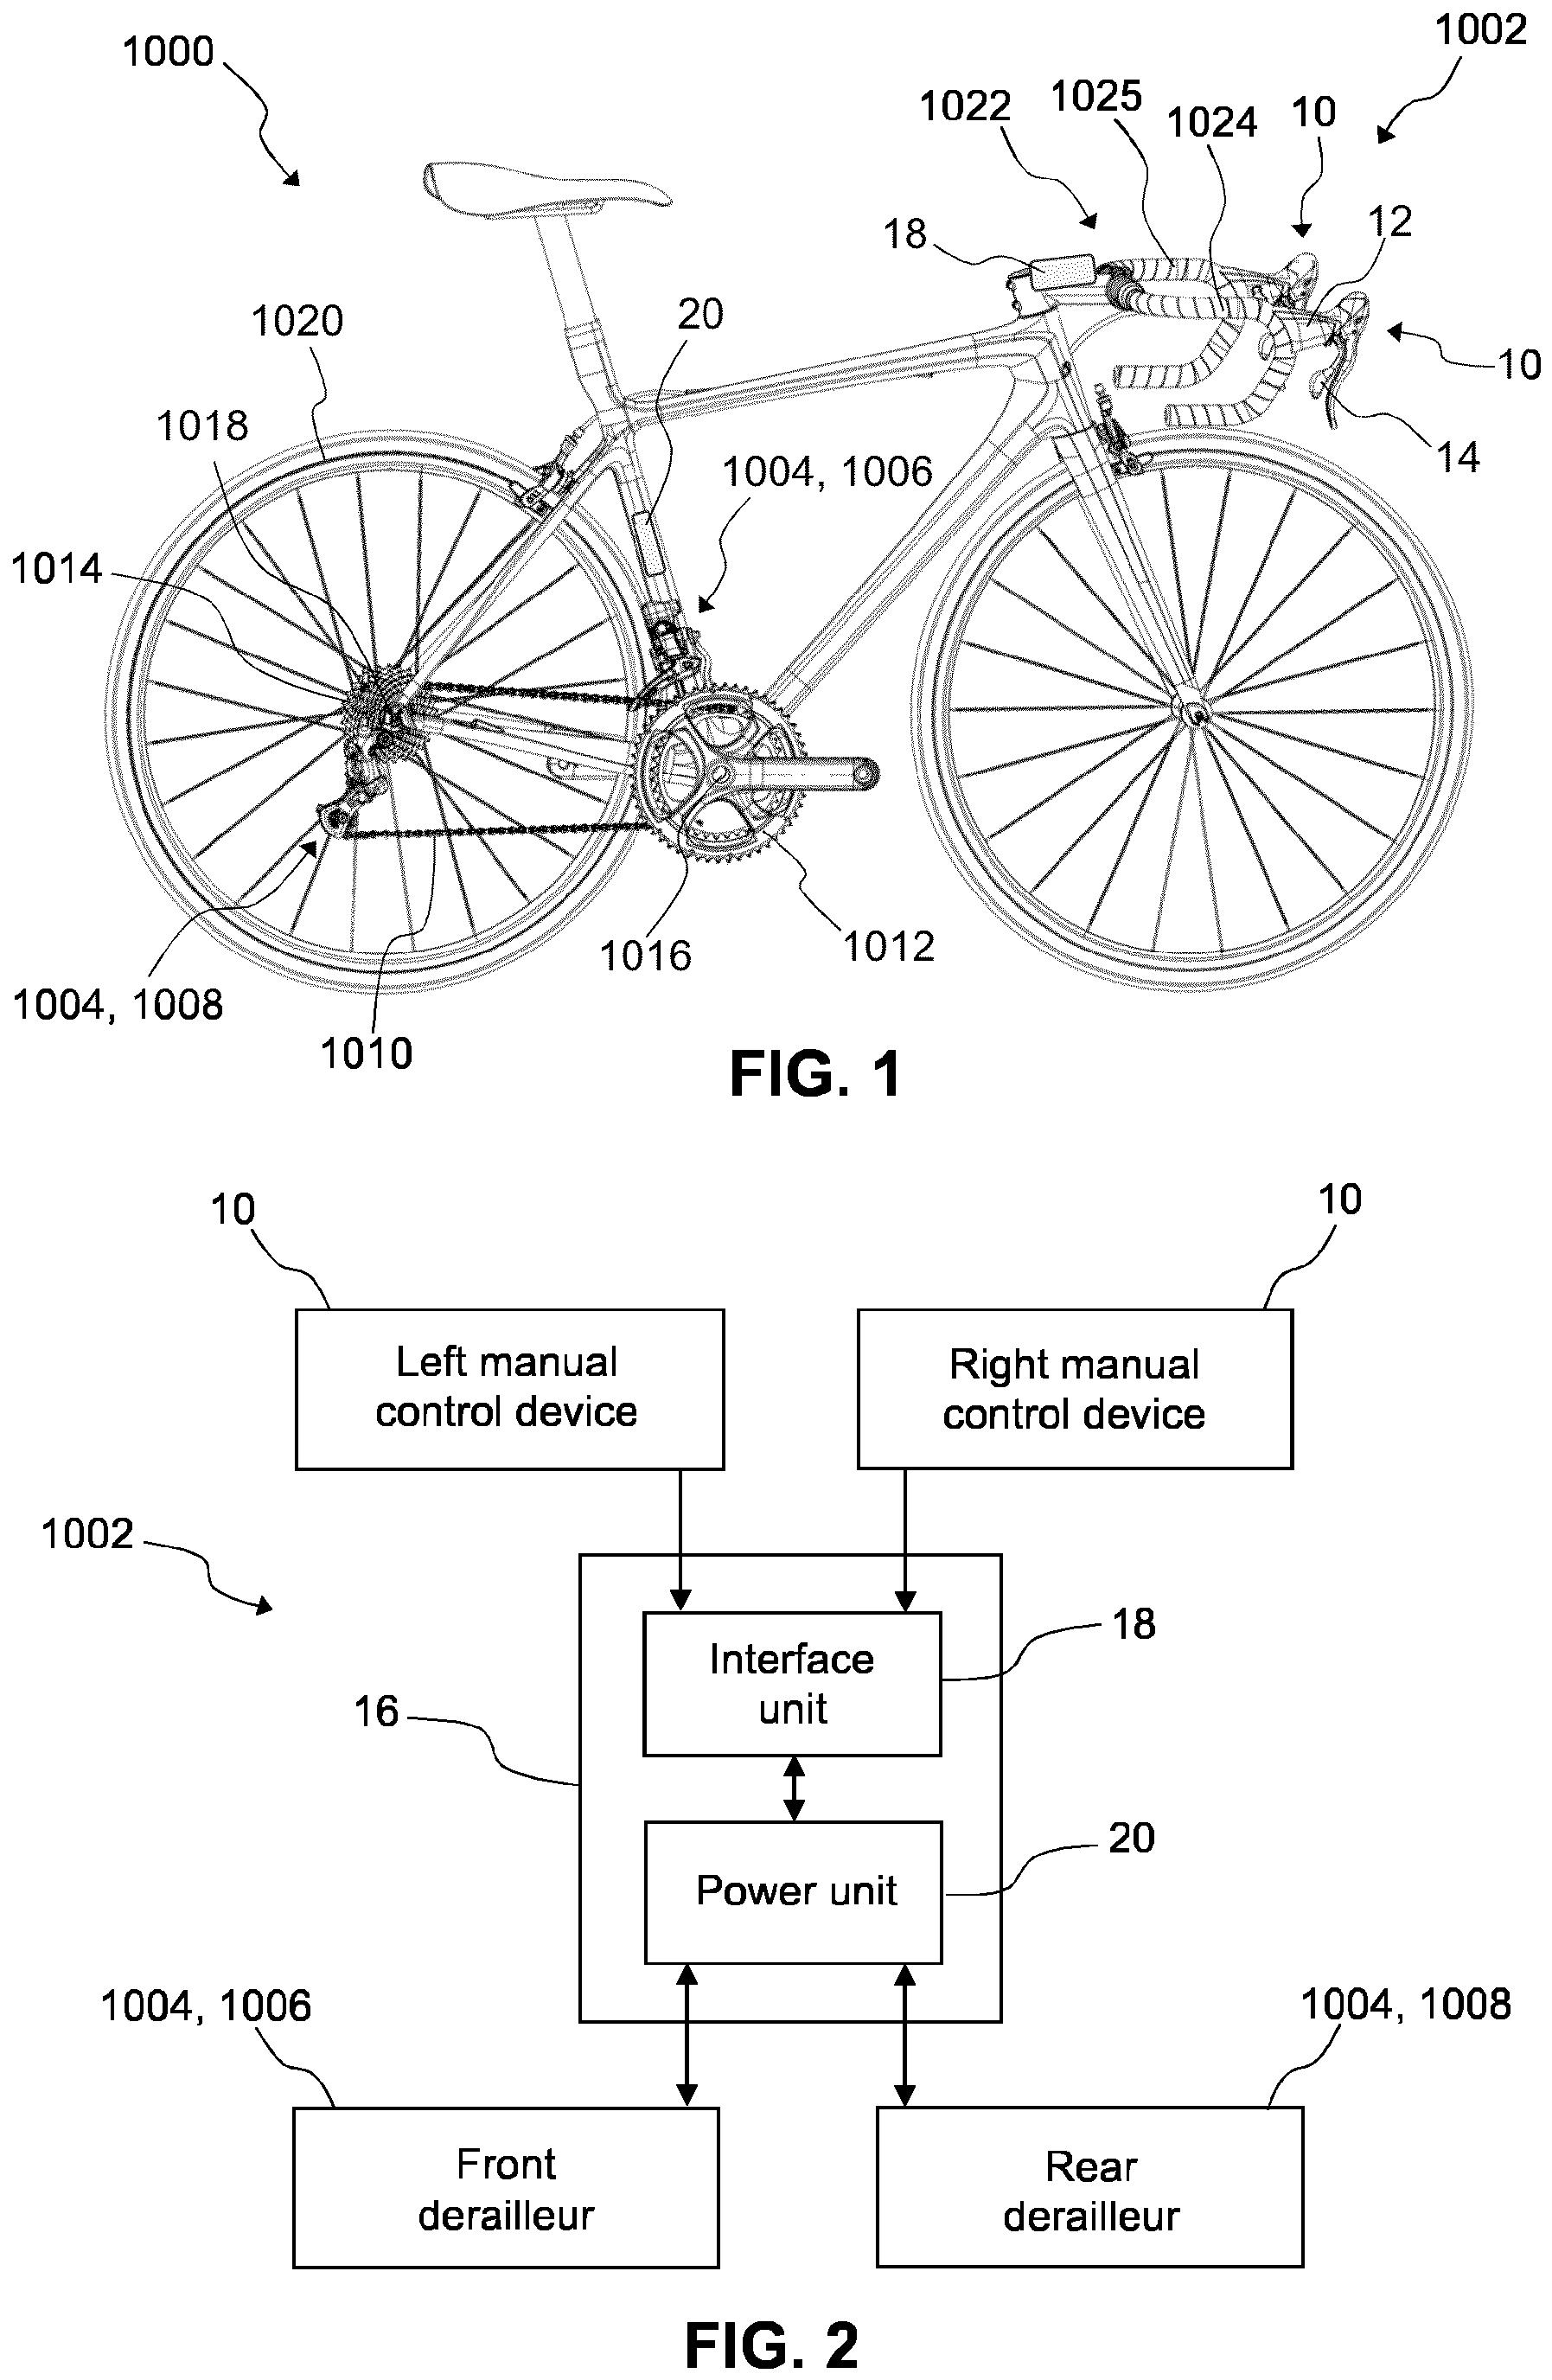 fixierbandage patent 0476623. Black Bedroom Furniture Sets. Home Design Ideas